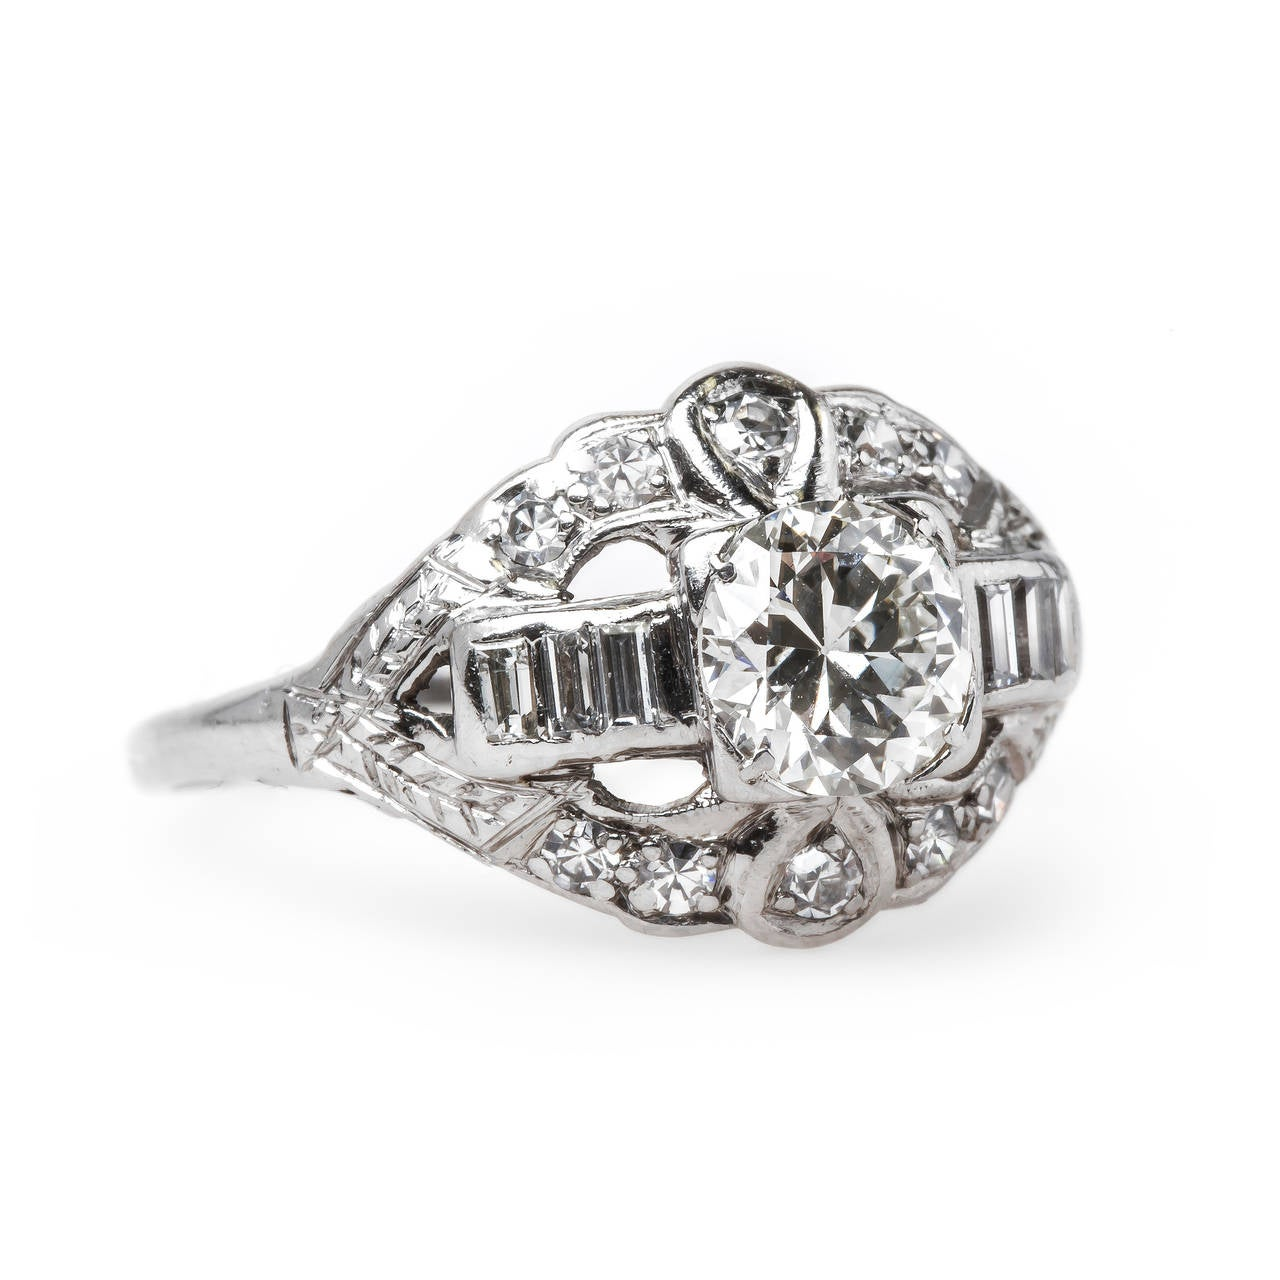 deco platinum engagement ring with beautiful